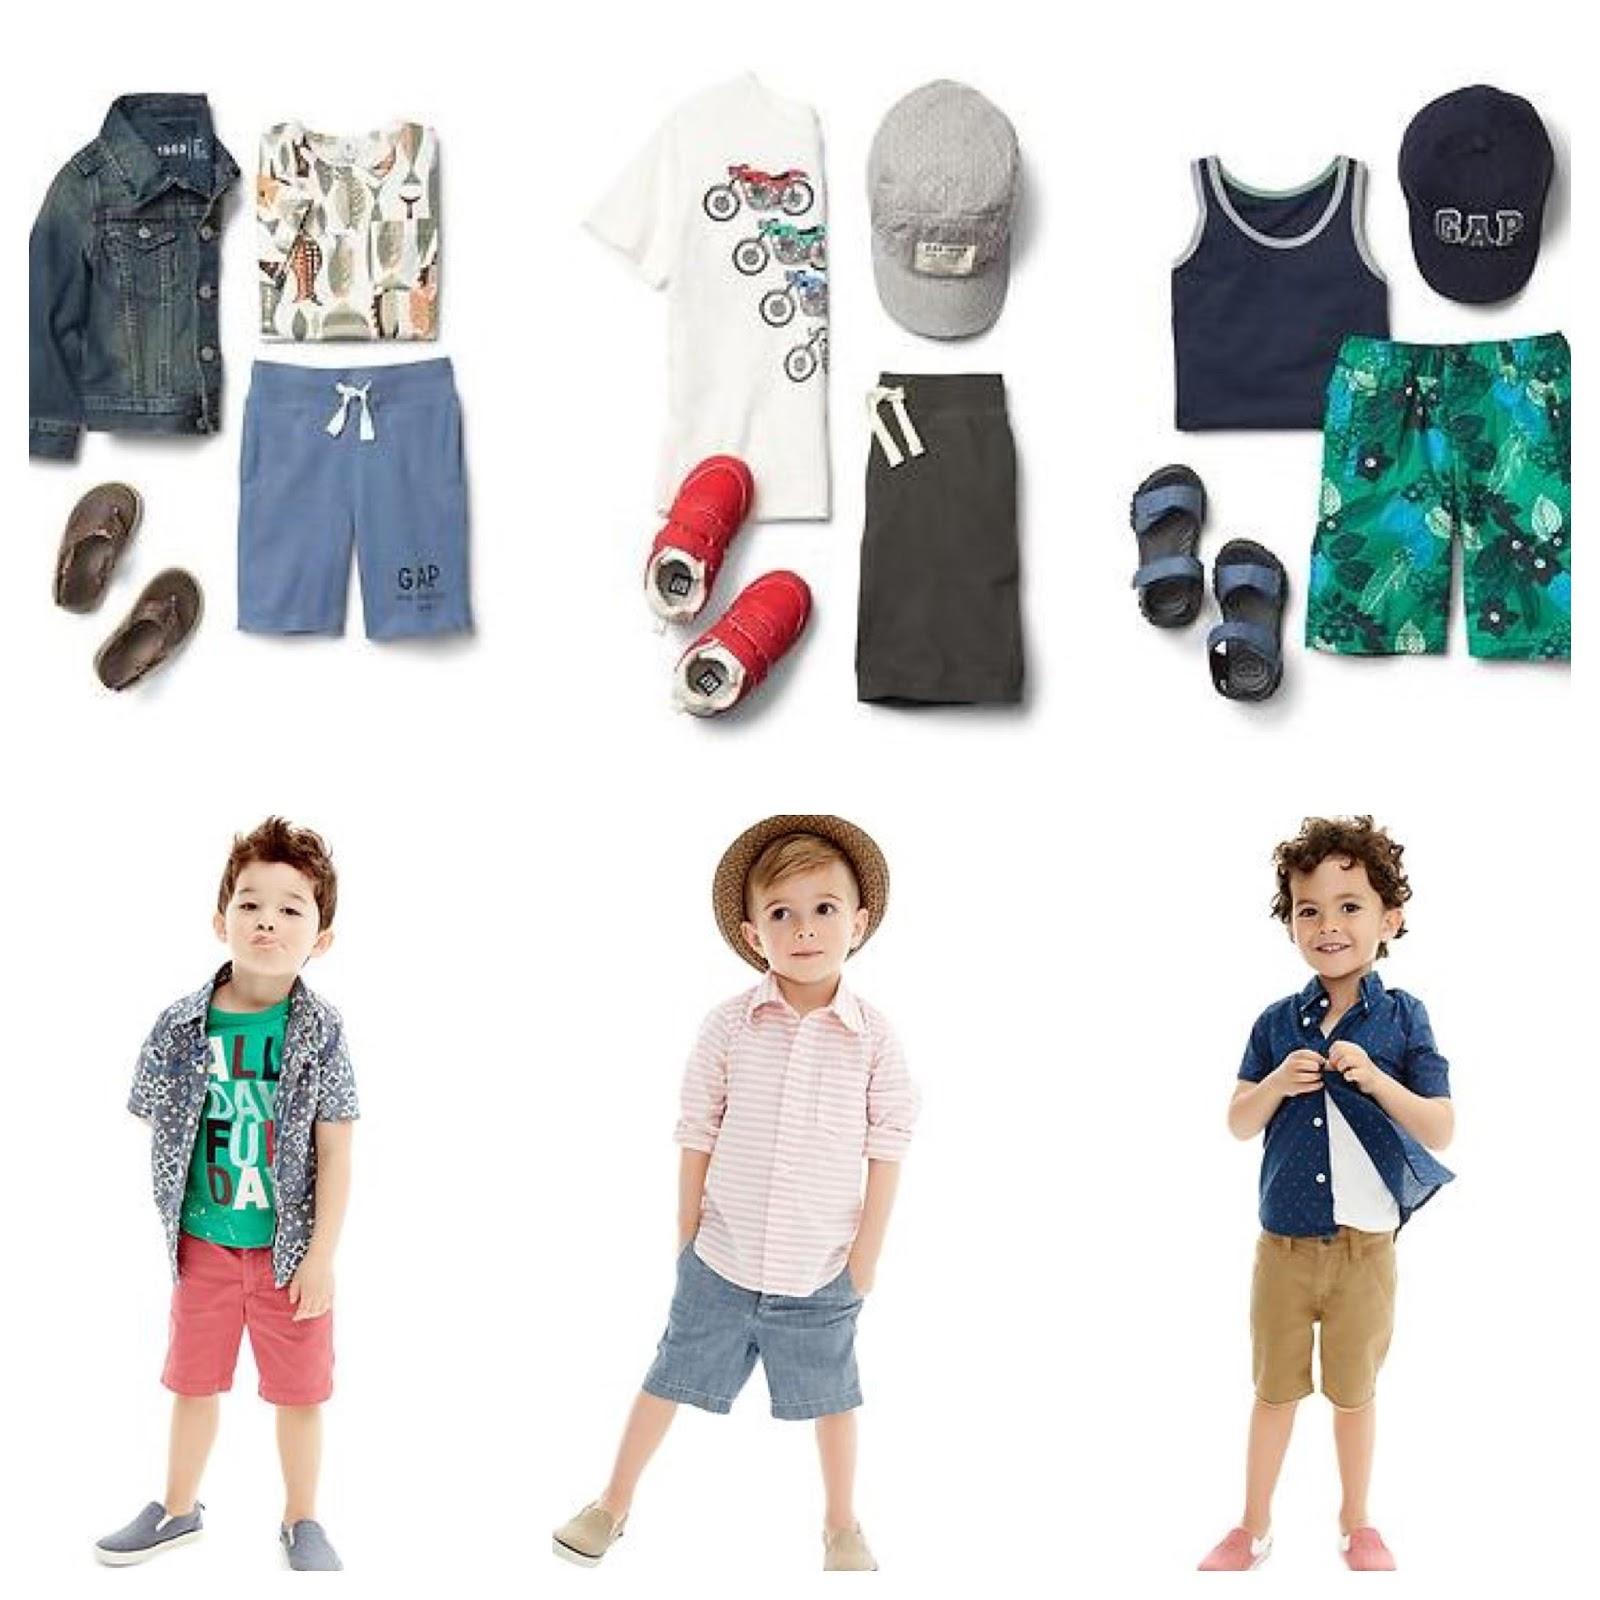 Fun Find Gap Kids u0026 Baby Gap Summer 2015 Collection u2013 Mommy in Dubai